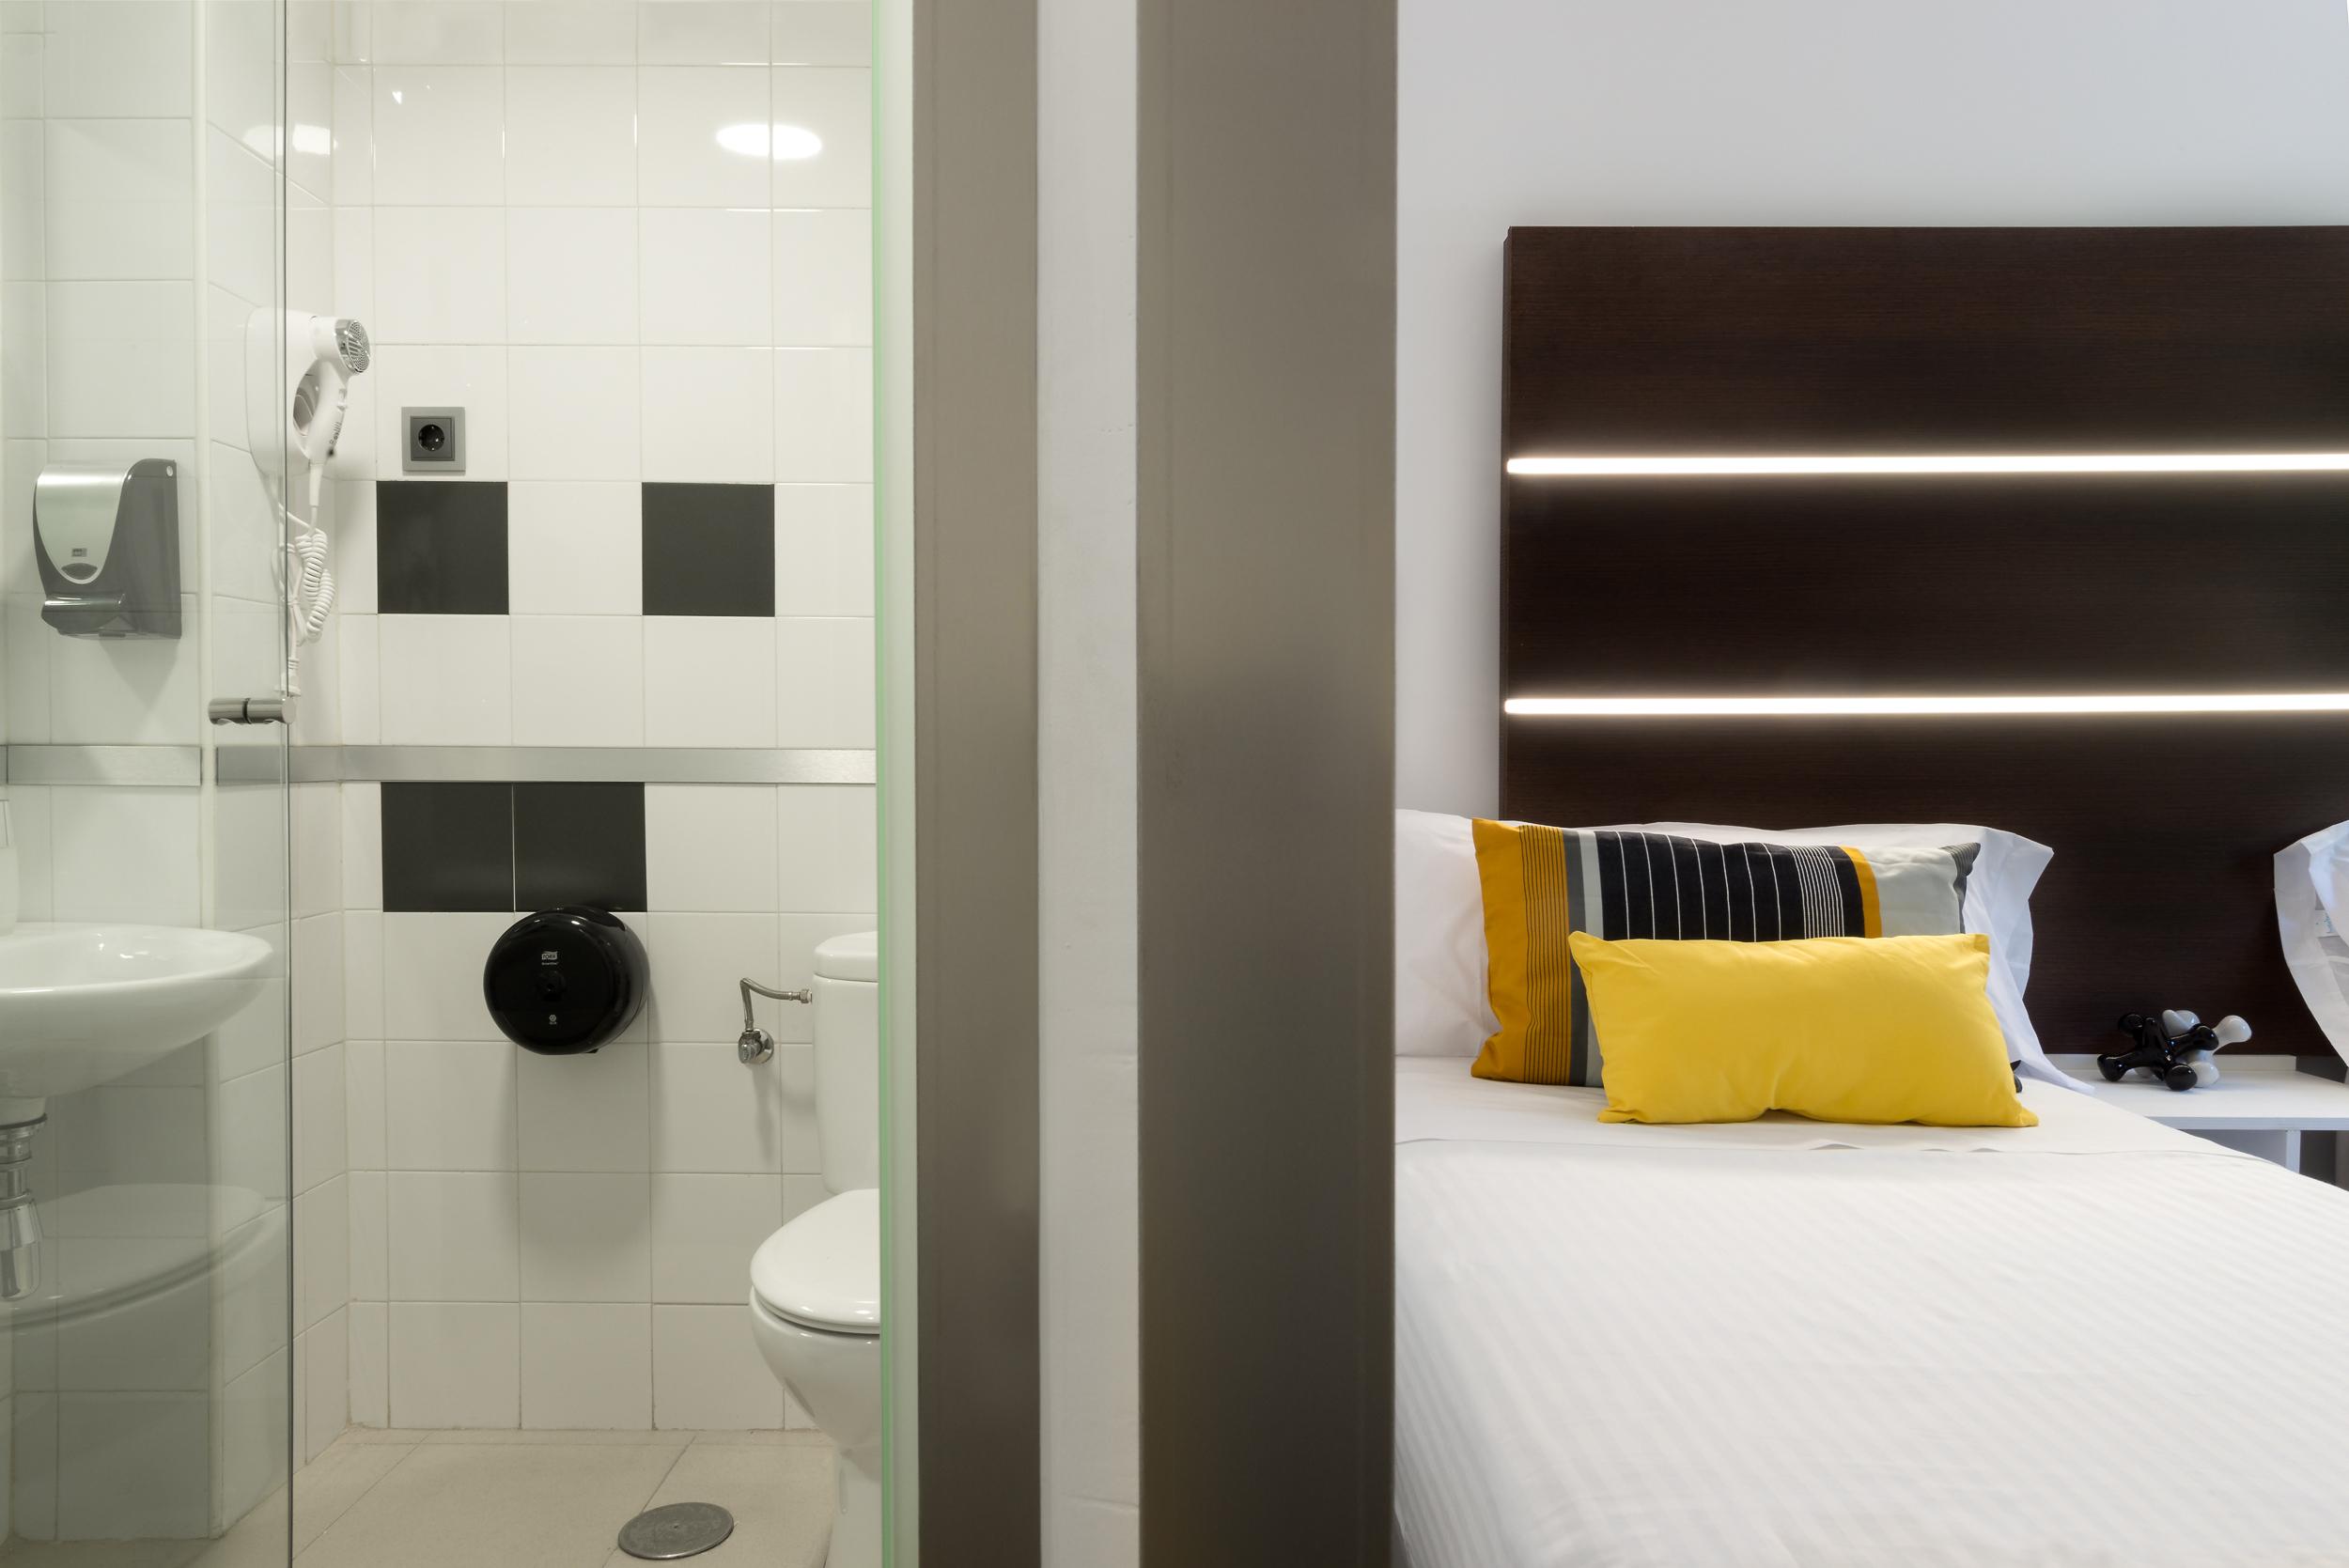 Habitaci n doble roisa hostal apartamentos turisticos for Licencia apartamento turistico madrid